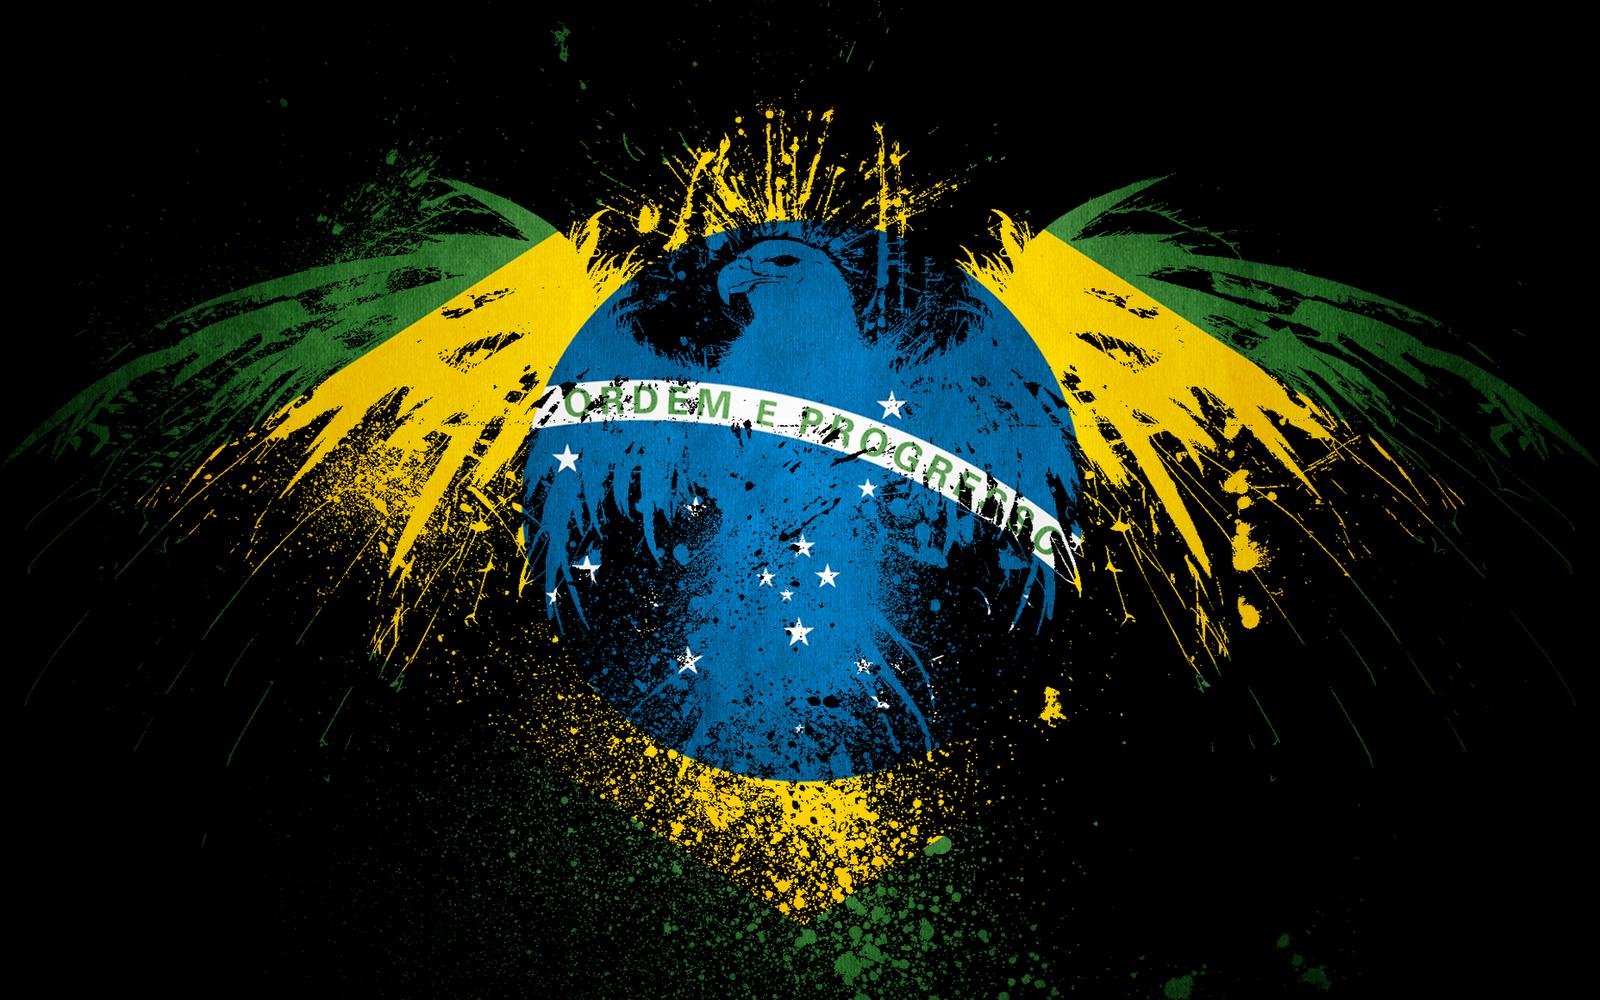 Imagens da Bandeira do Brasil   Imagens para Facebook Whatsapp 1600x1000